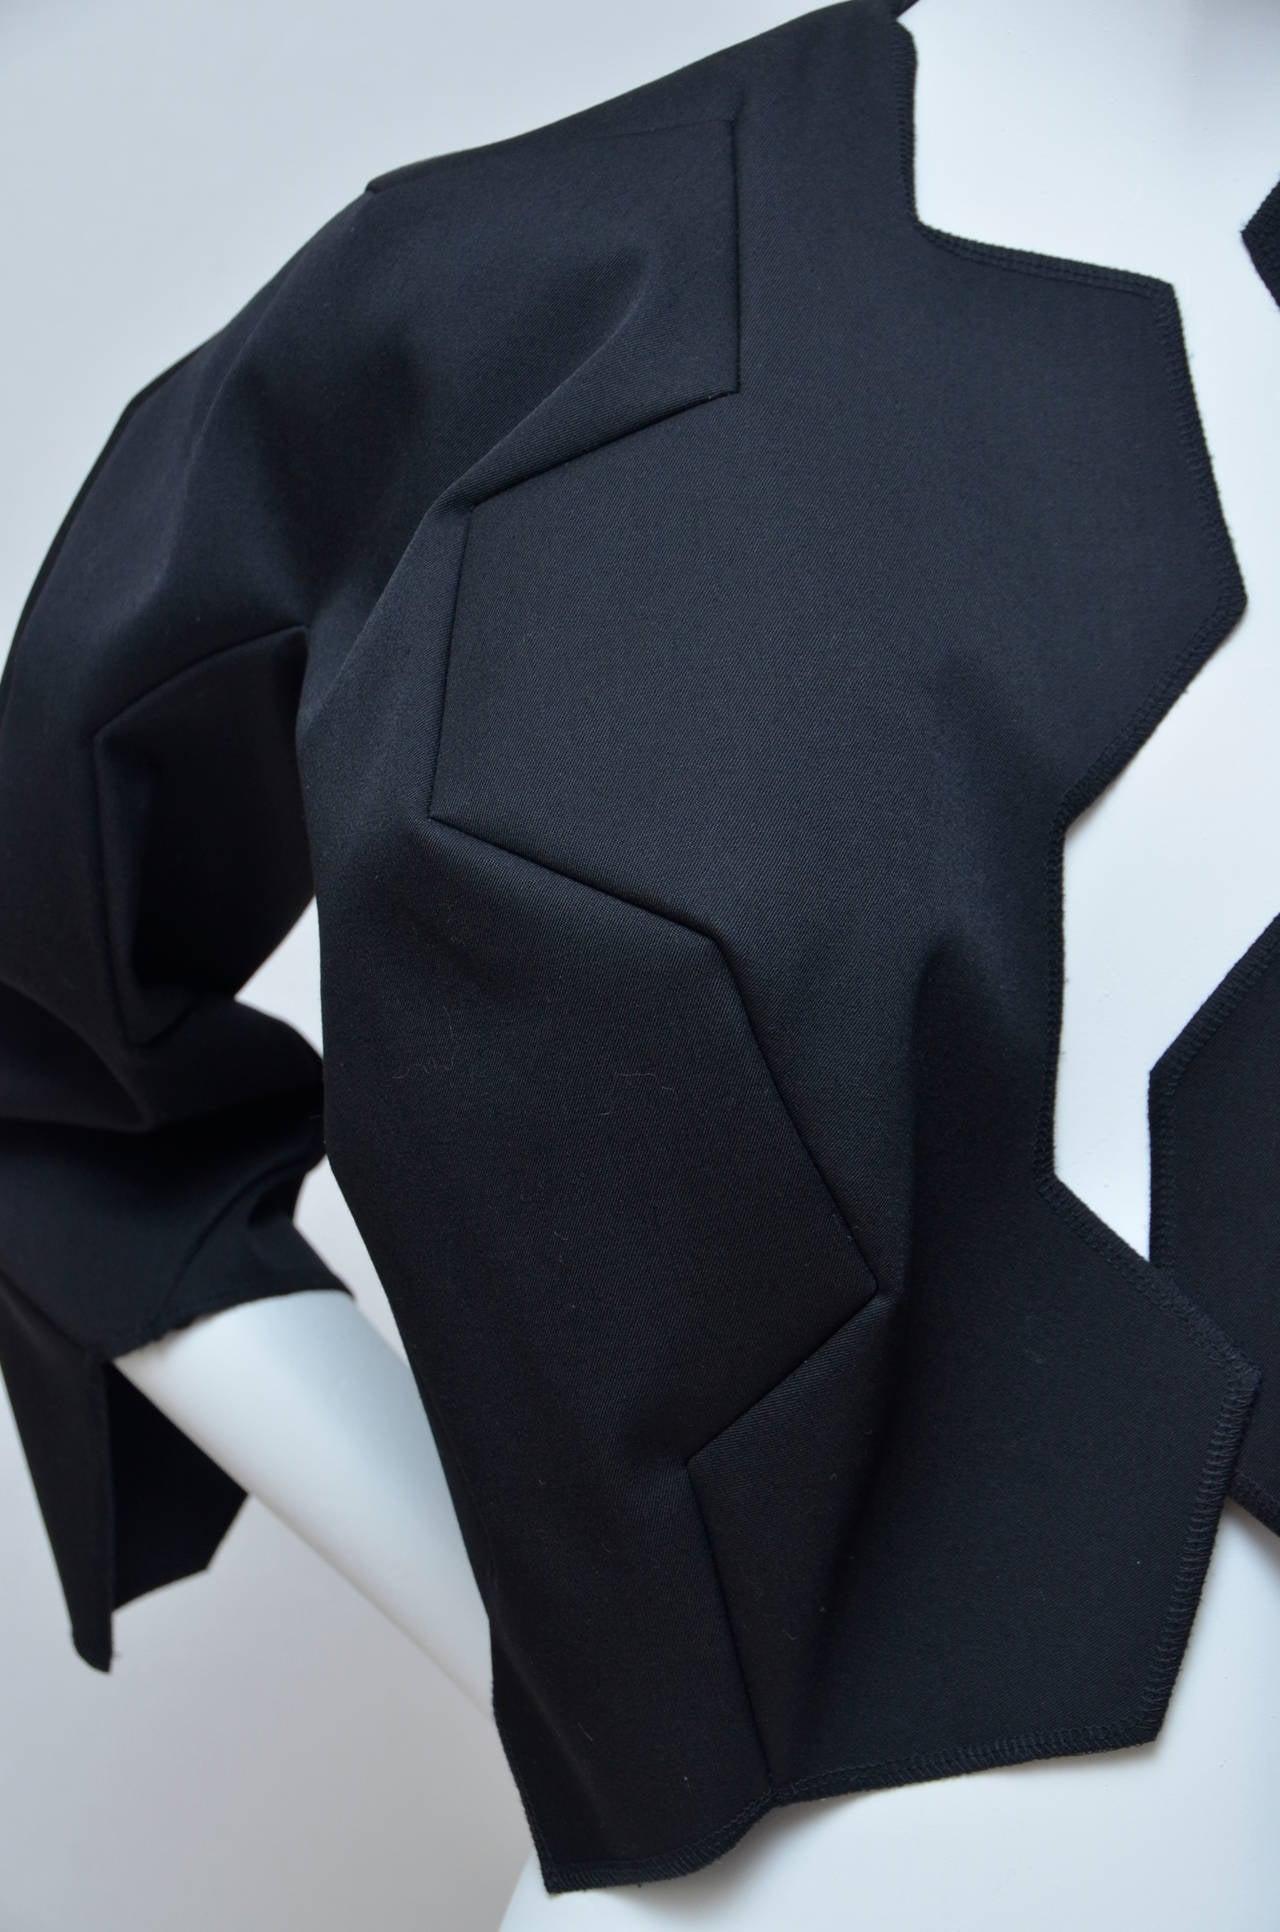 Black Comme Des Garcons Football Soccer Set Runway Jacket  and Skirt Ad 2008 For Sale